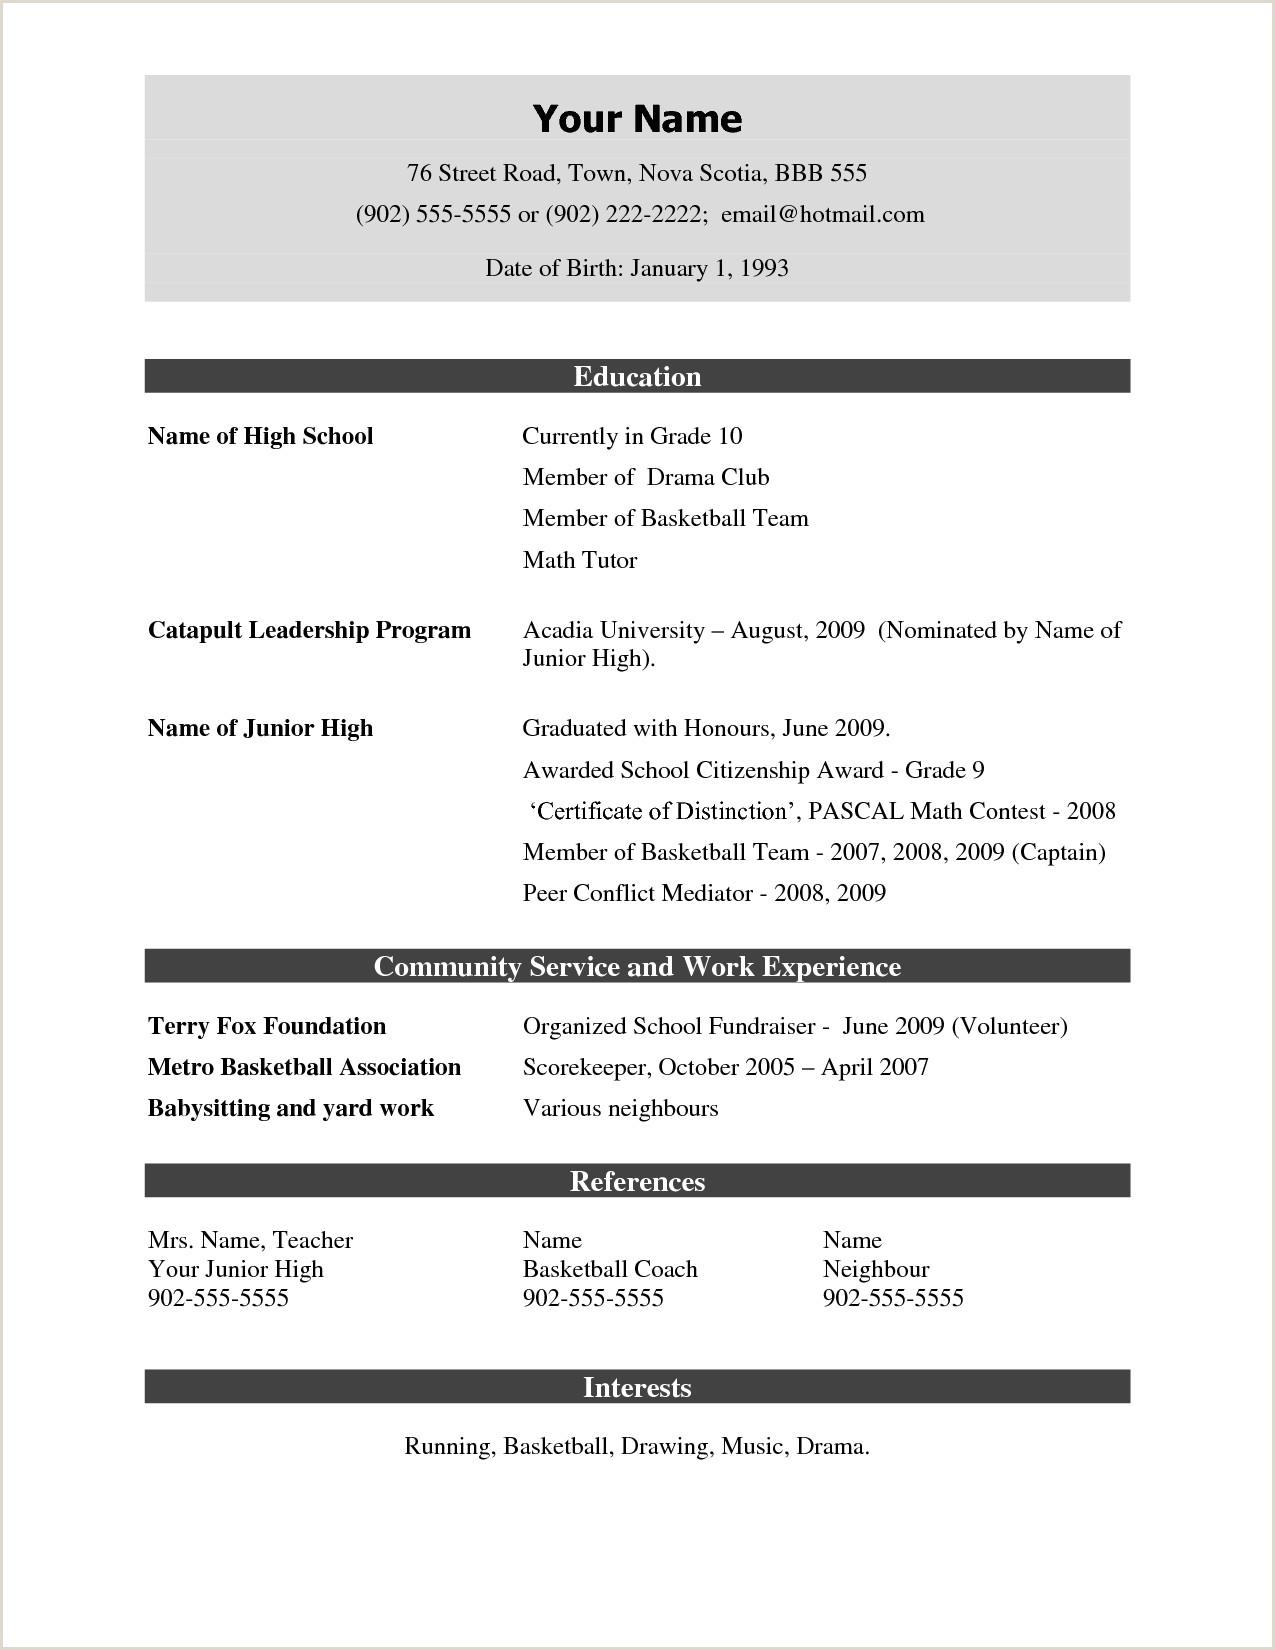 Fresher Teacher Resume Format Pdf Download Resume Samples Free Download Templates Cv Pdf For Freshers